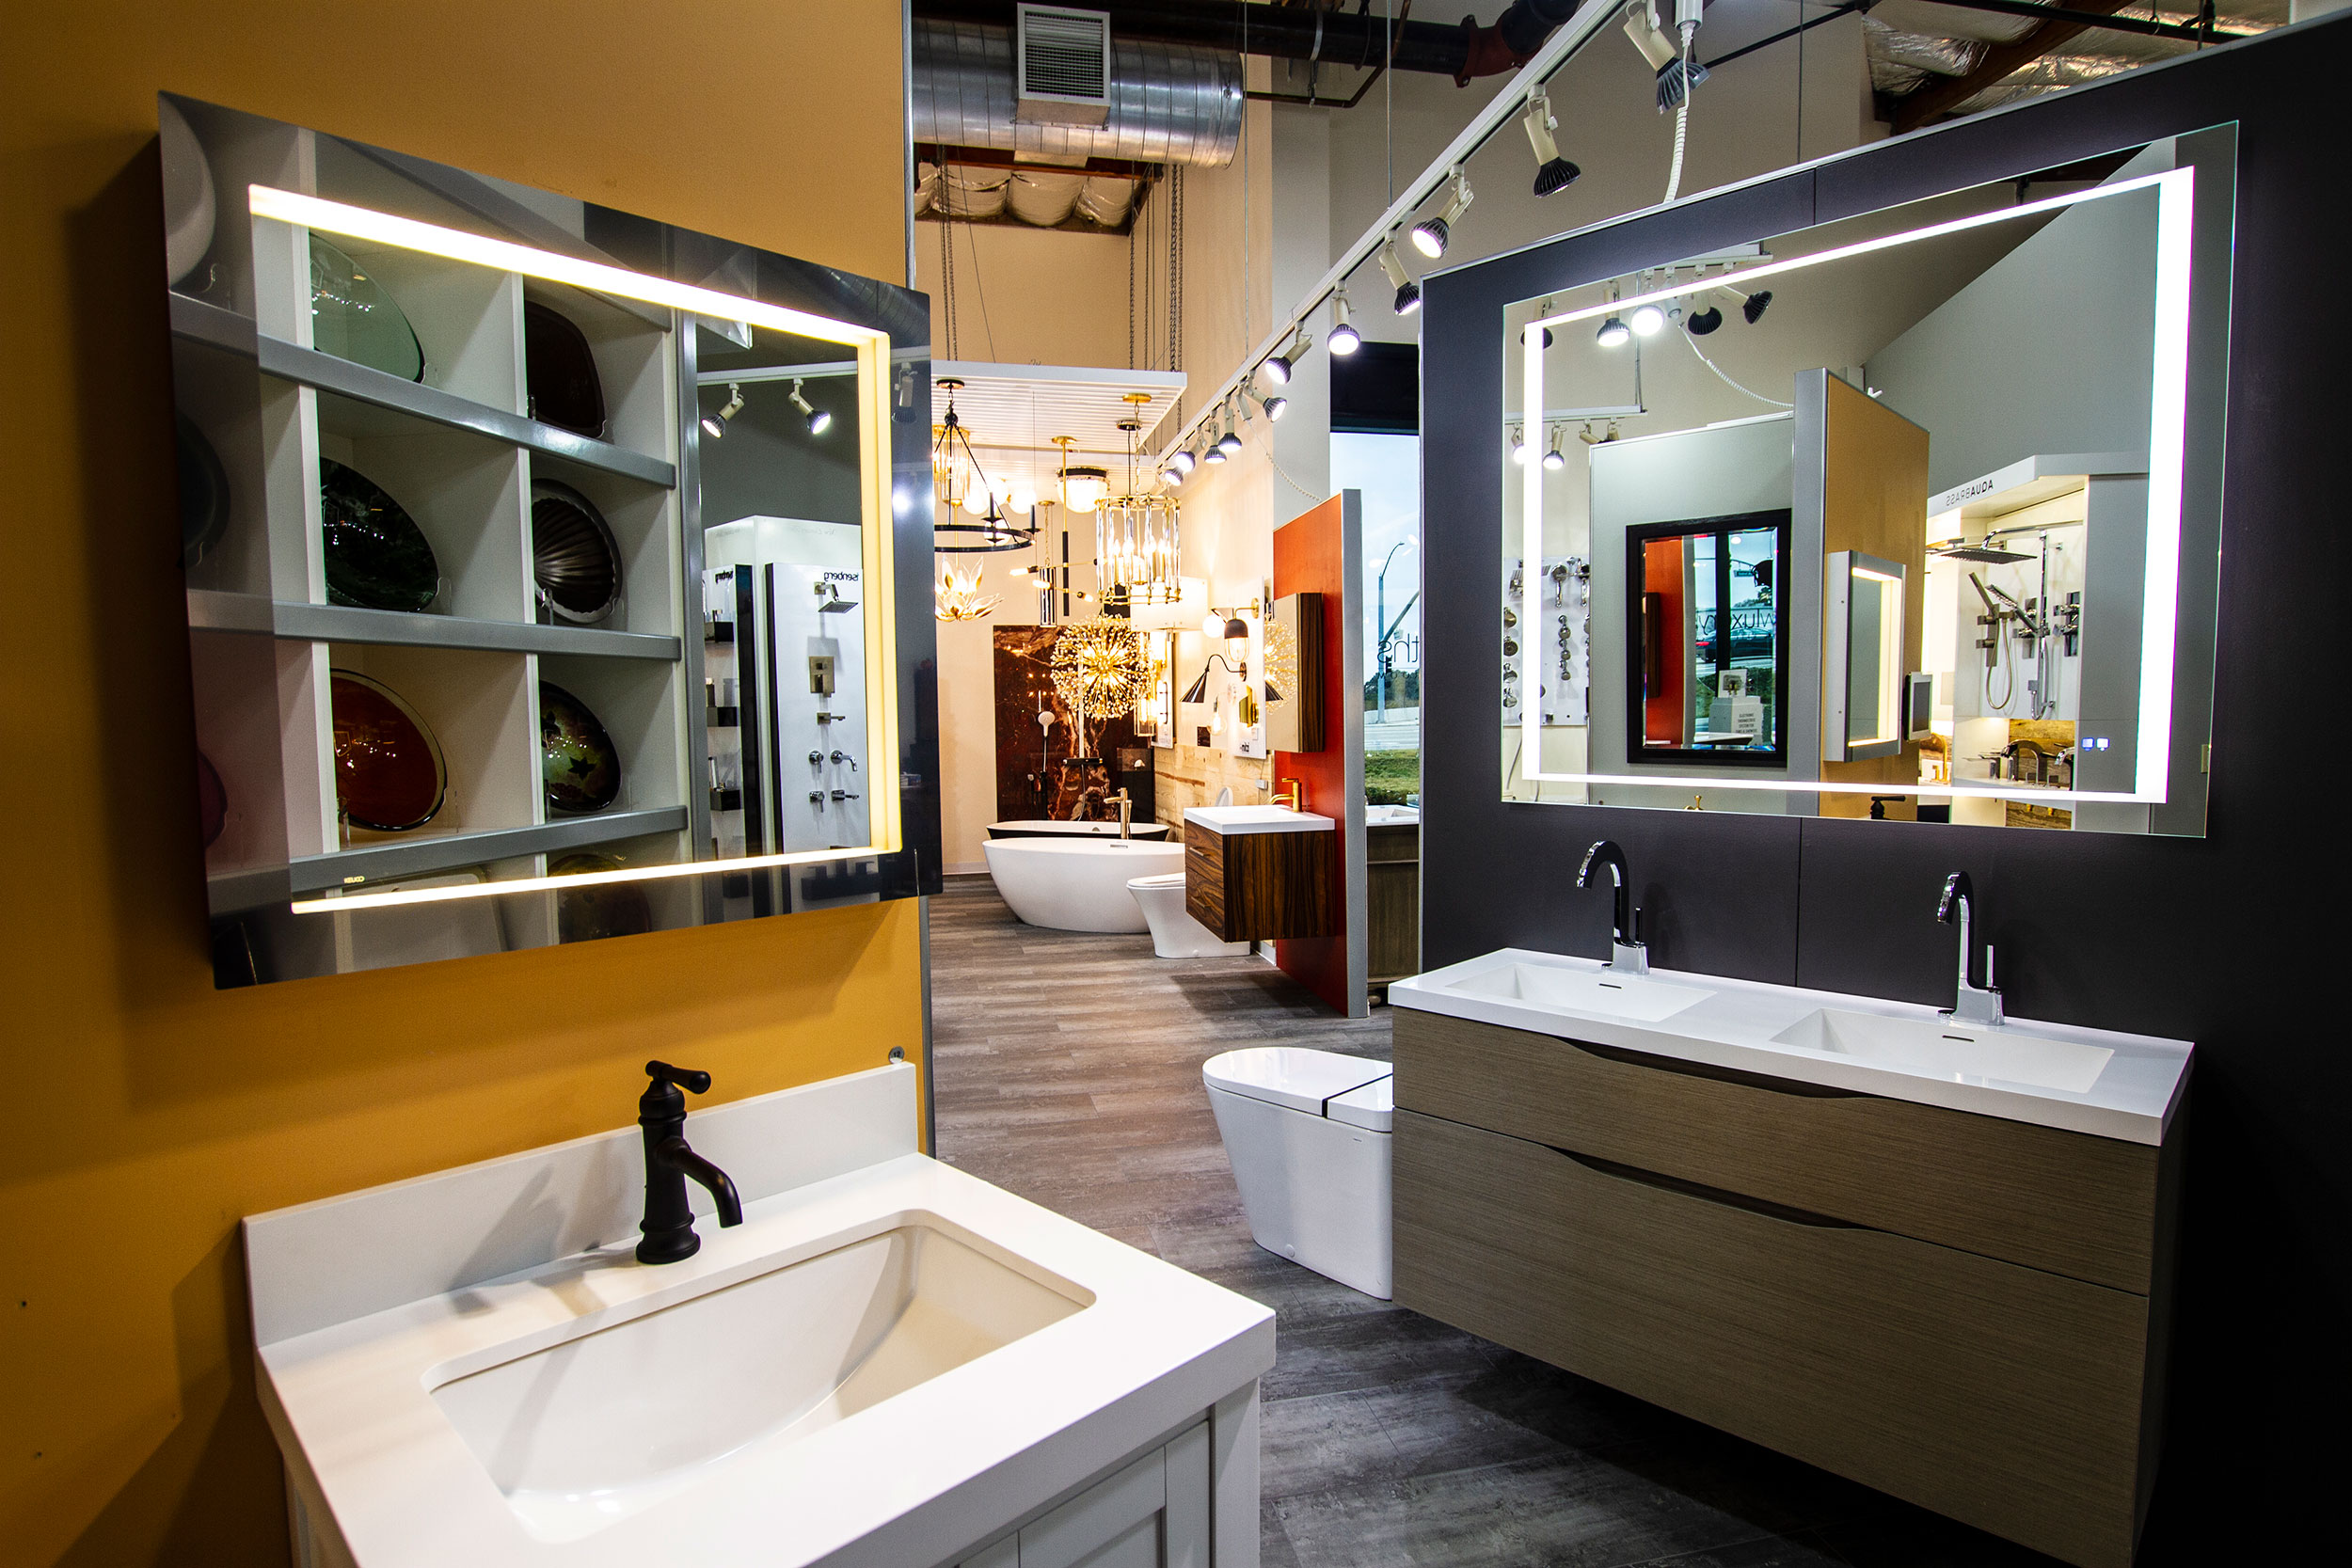 bg homepage showroom